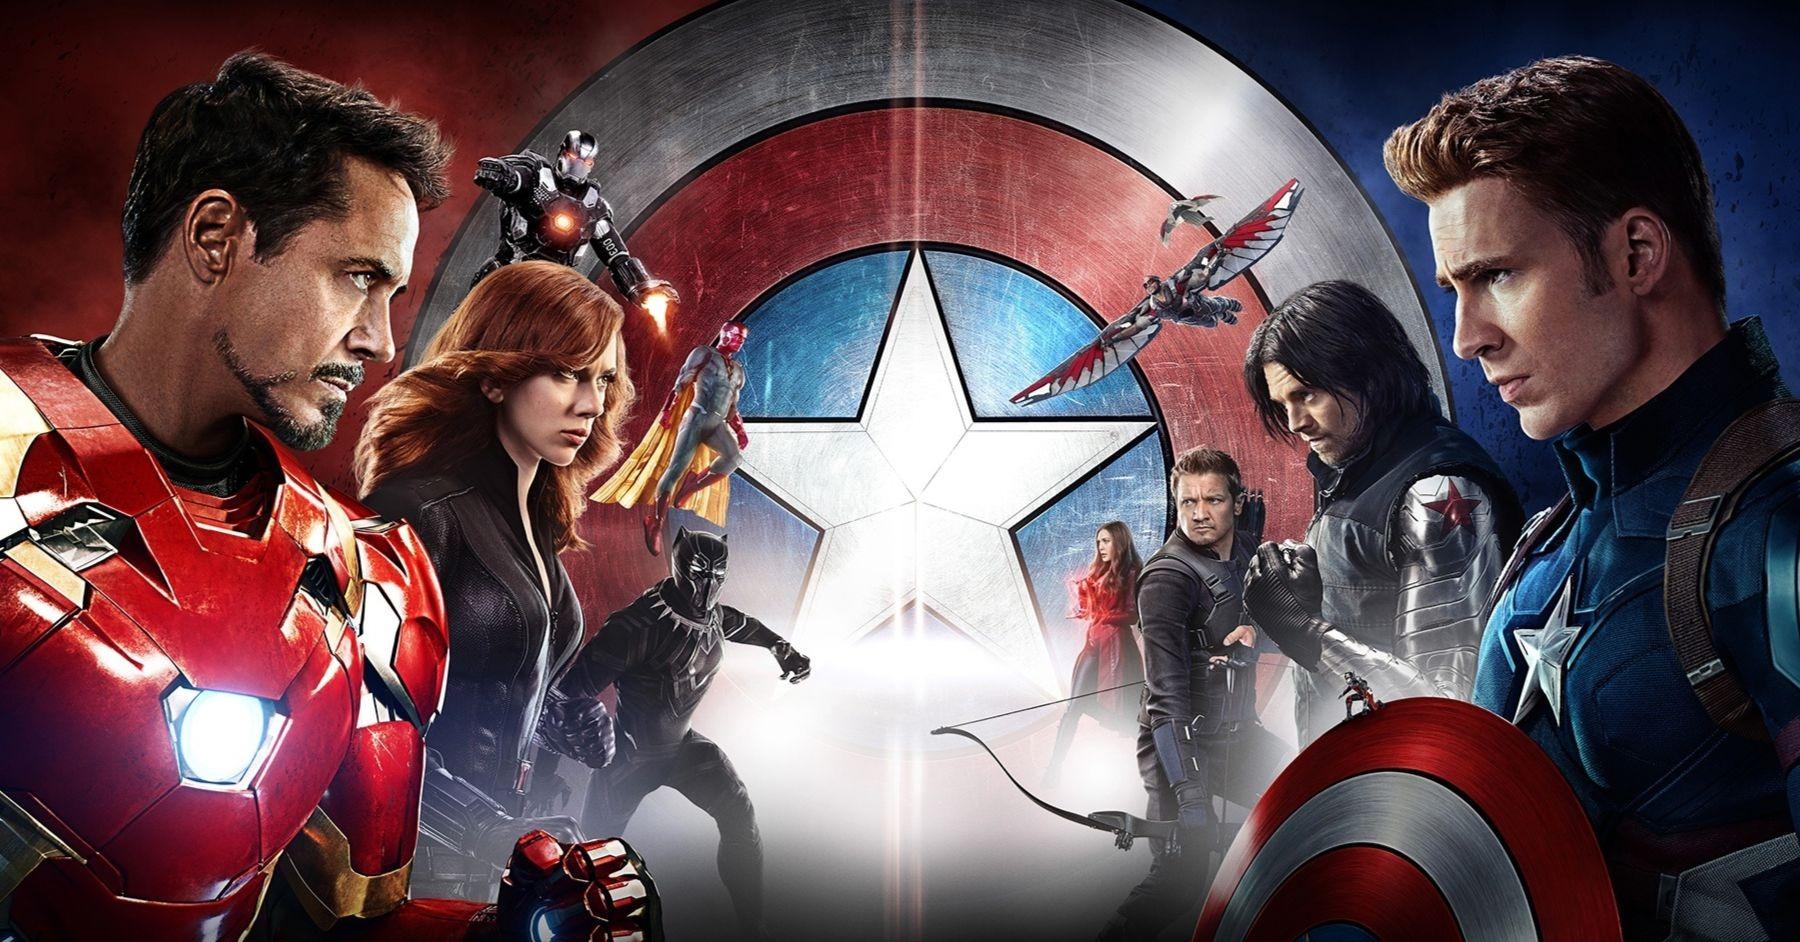 Guerra Civil: relembre o confronto que dividiu os Vingadores